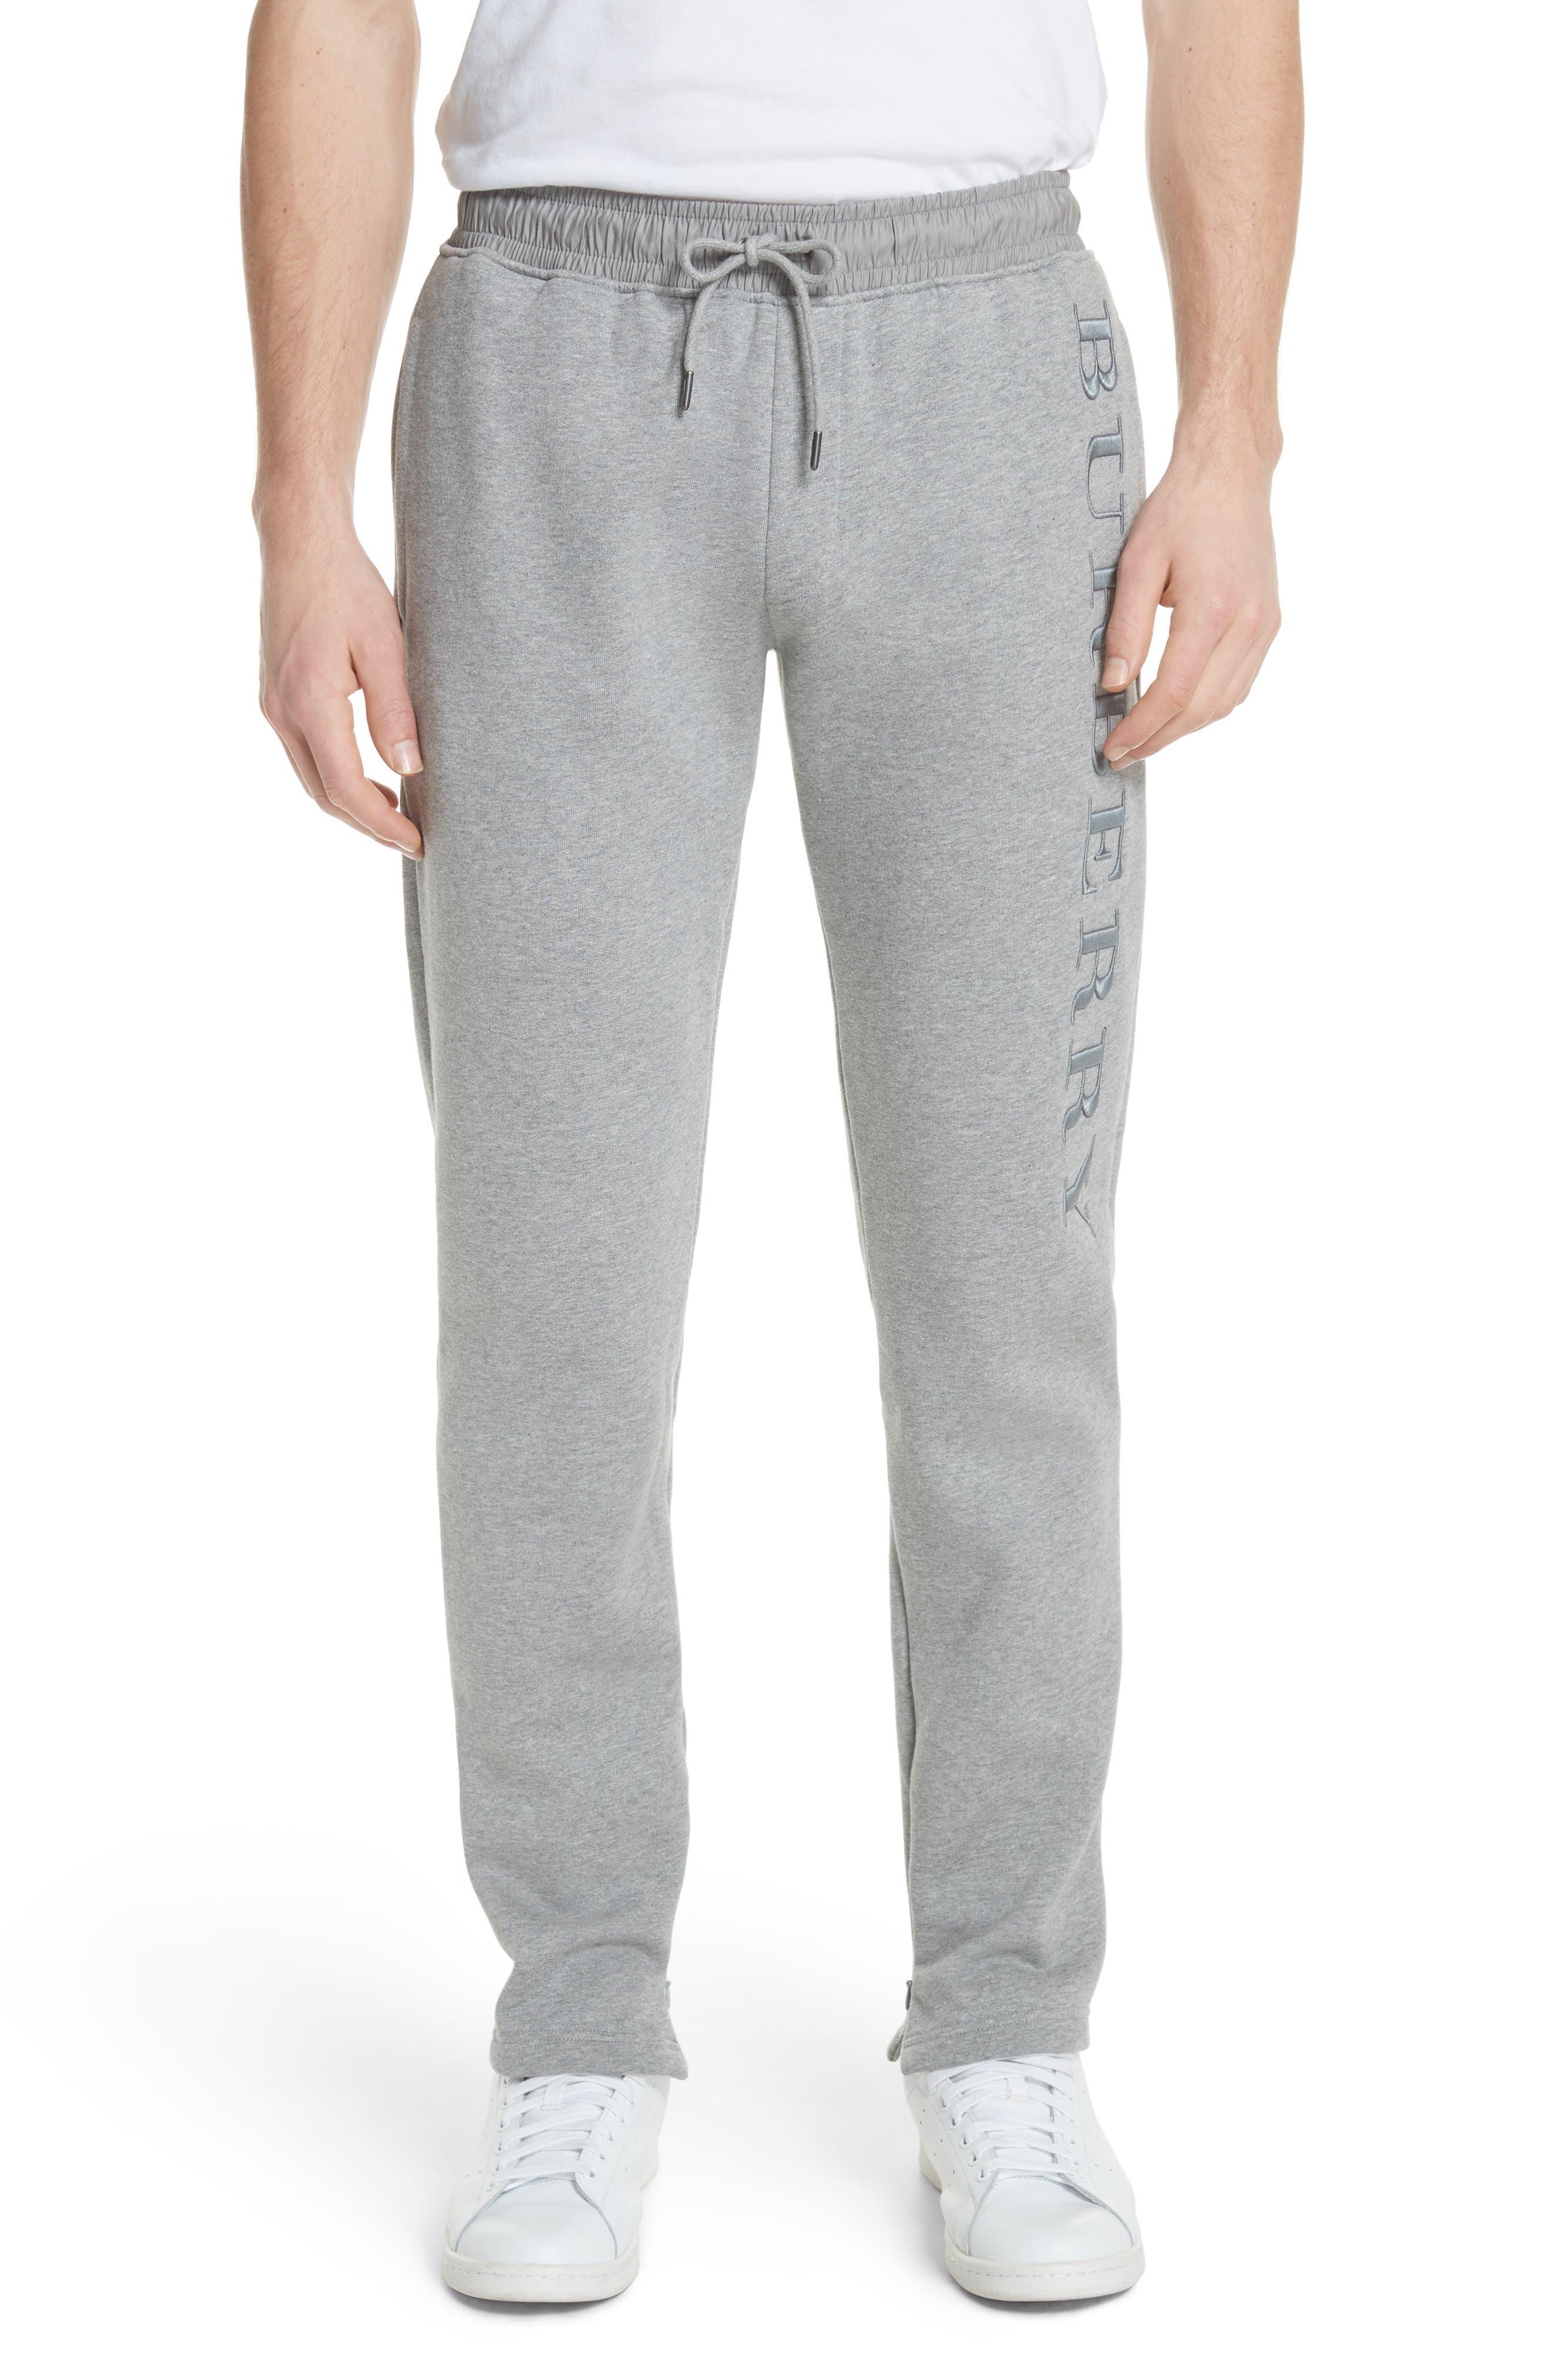 Nickford Lounge Pants,                         Main,                         color, Pale Grey Melange